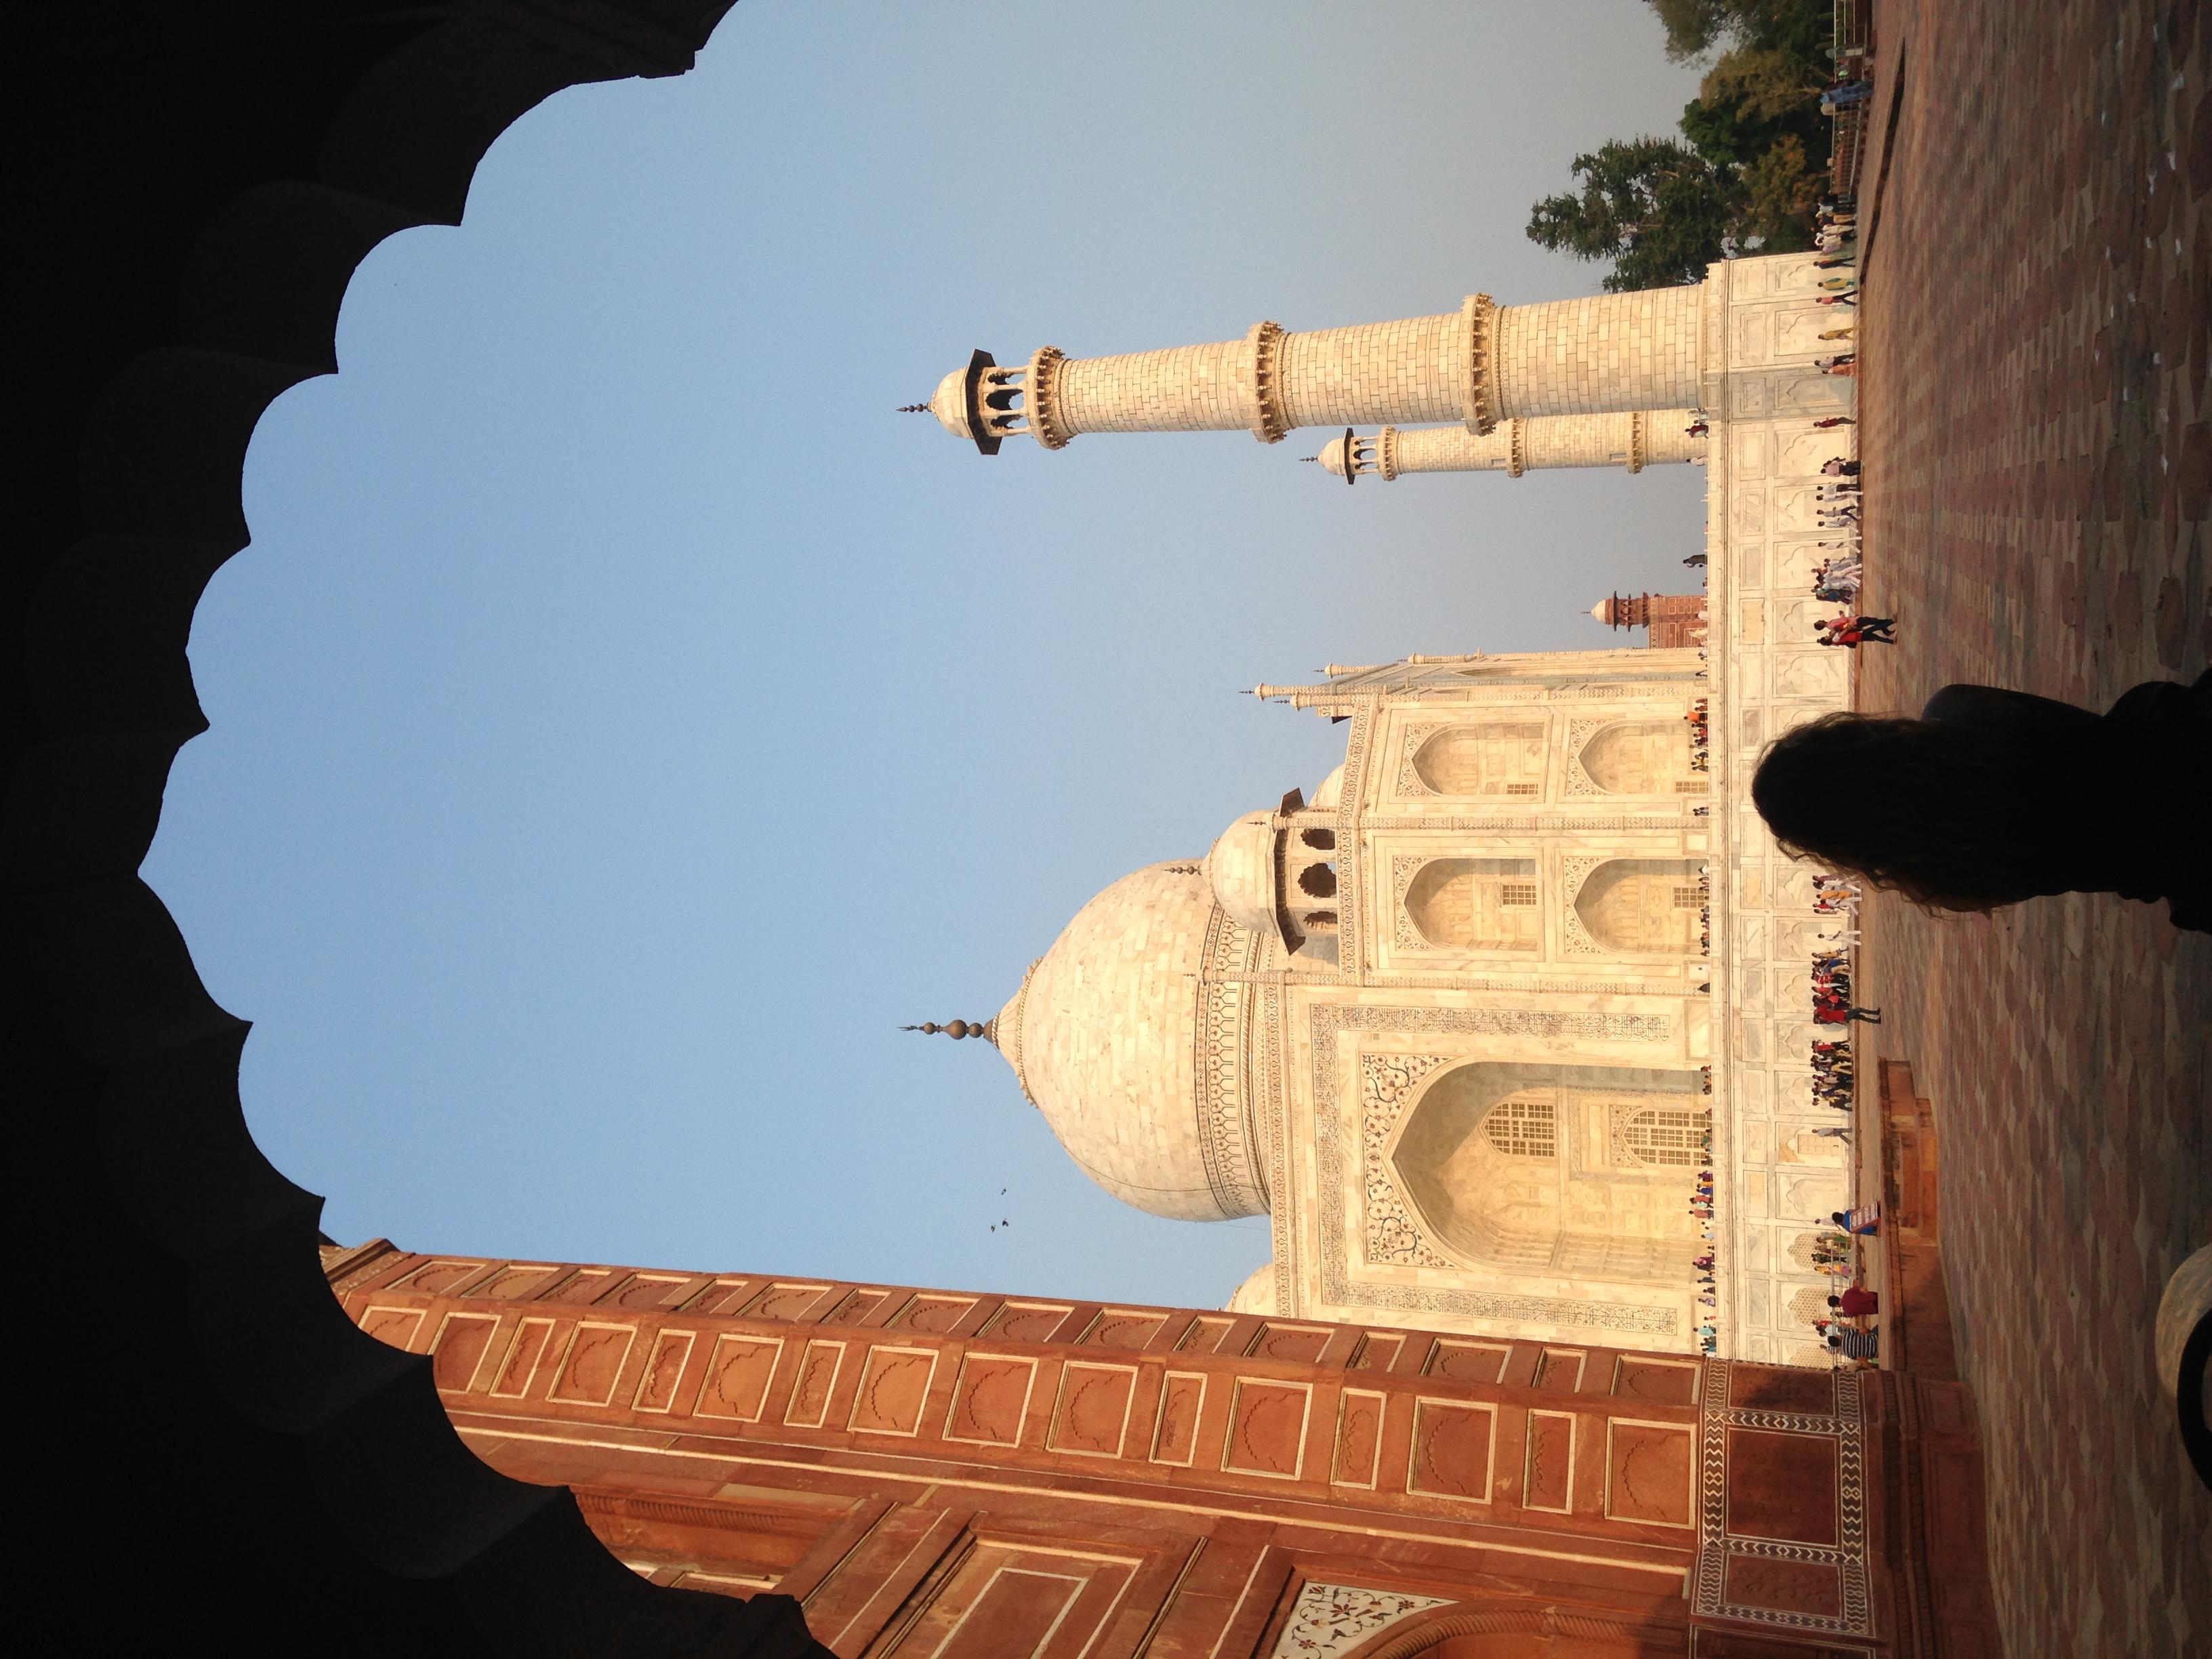 TajMahal - Agra